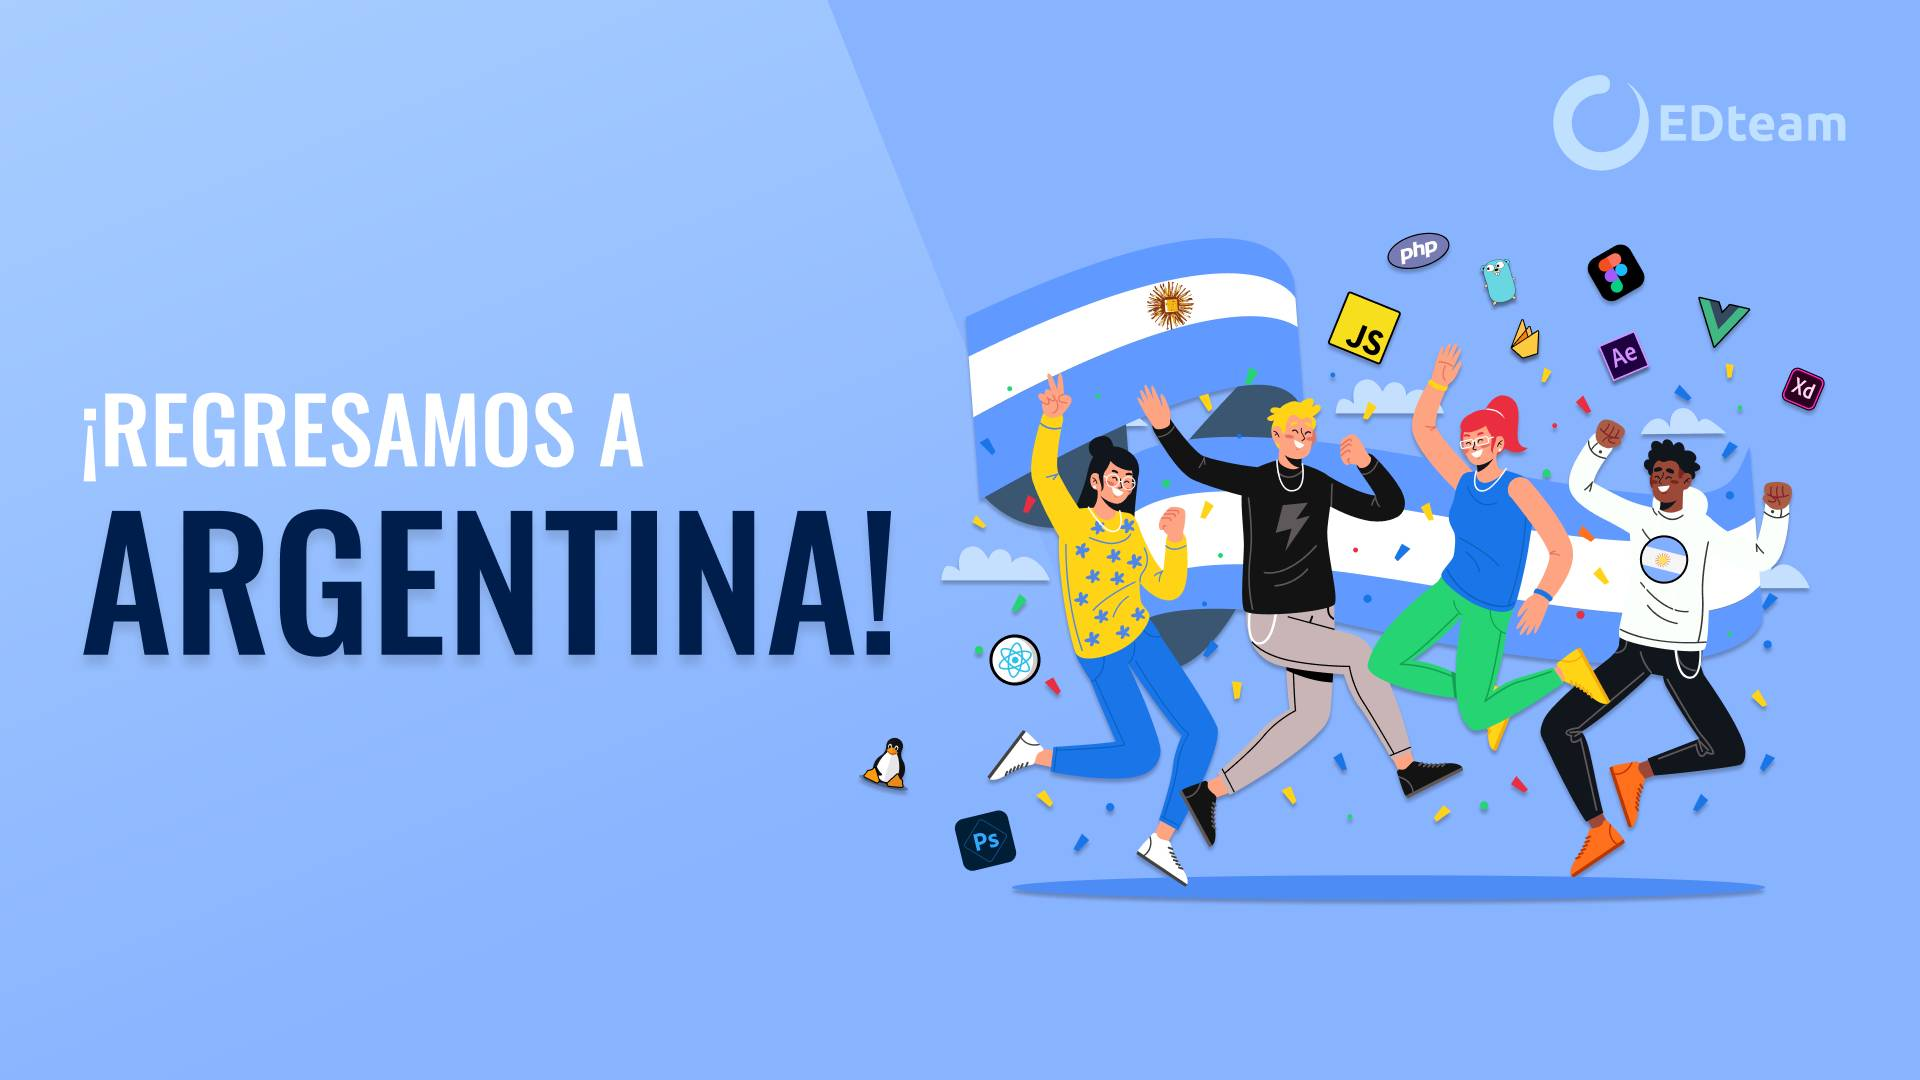 ¡Volvimos a Argentina!